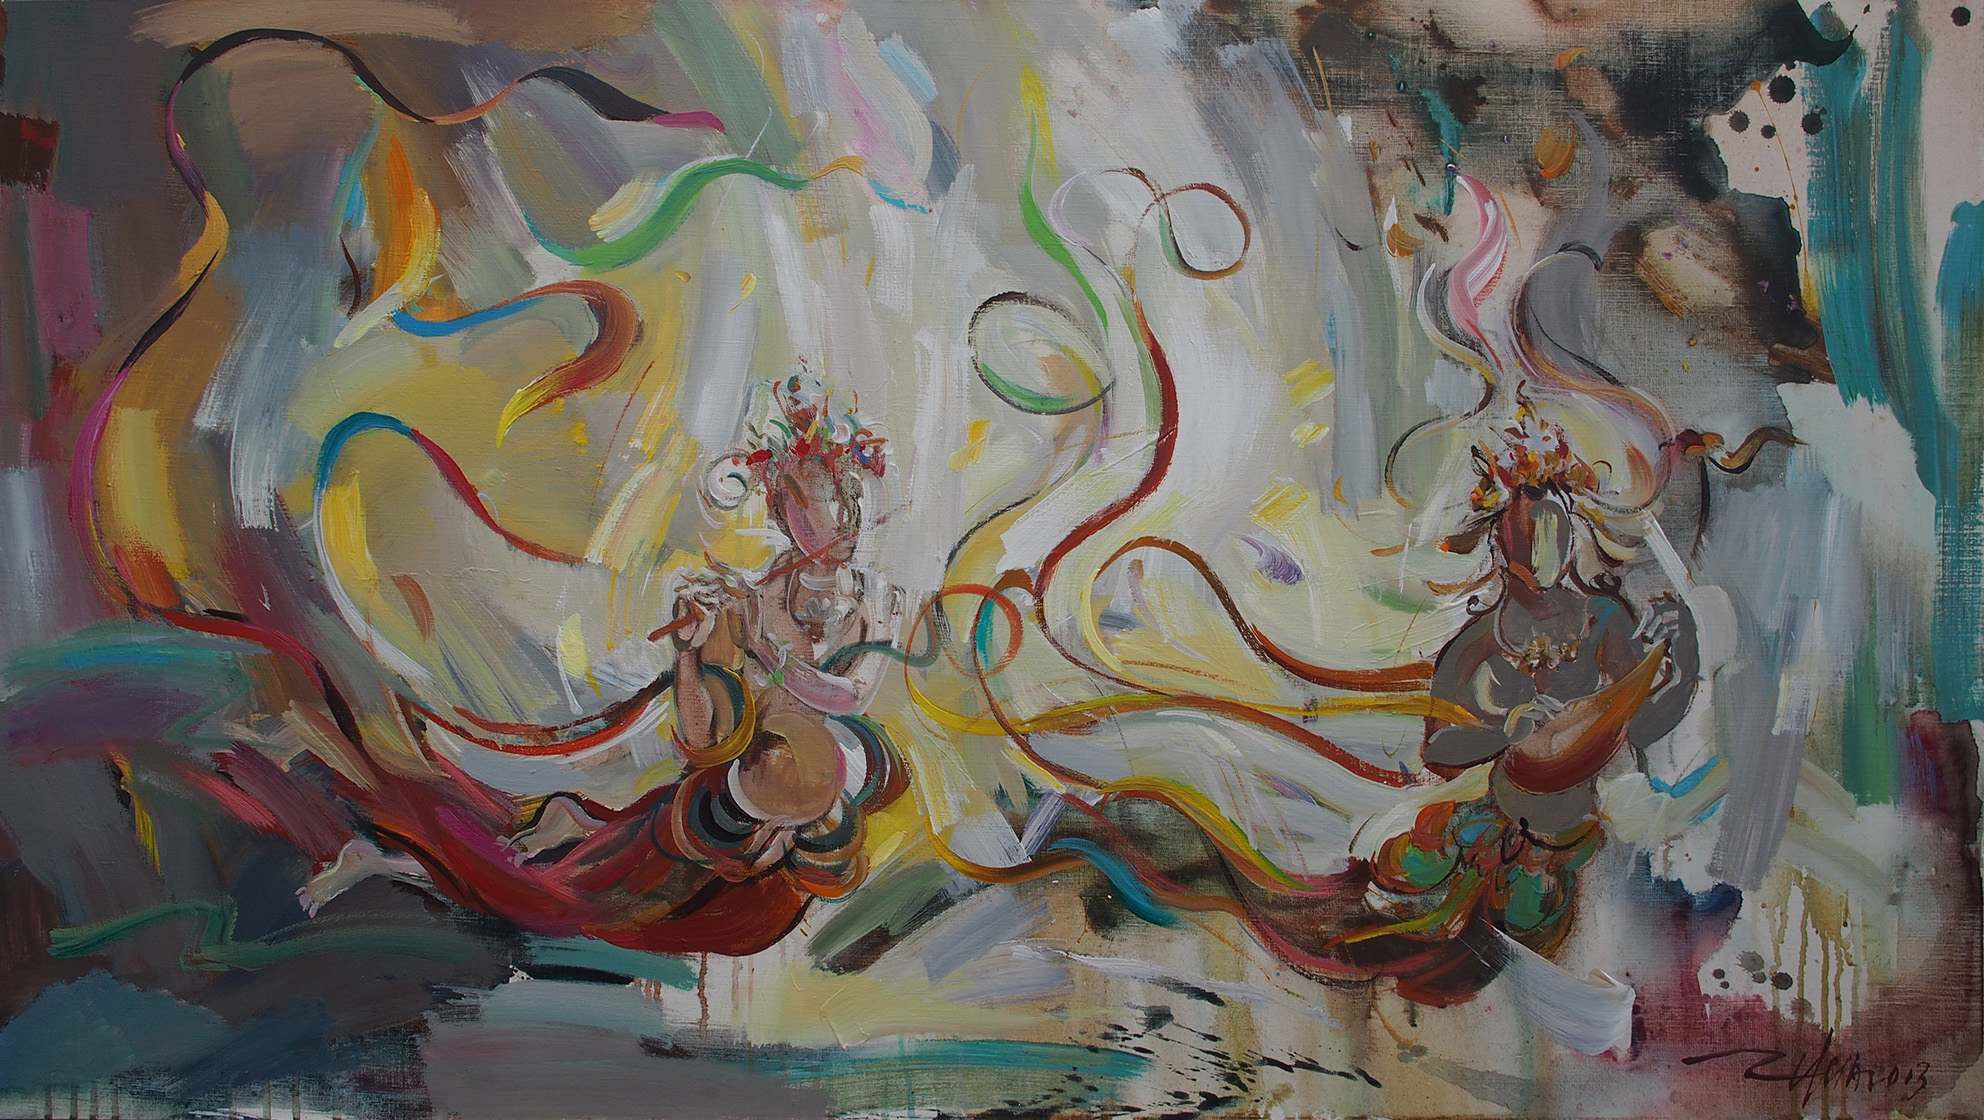 Silk Road Serenade III